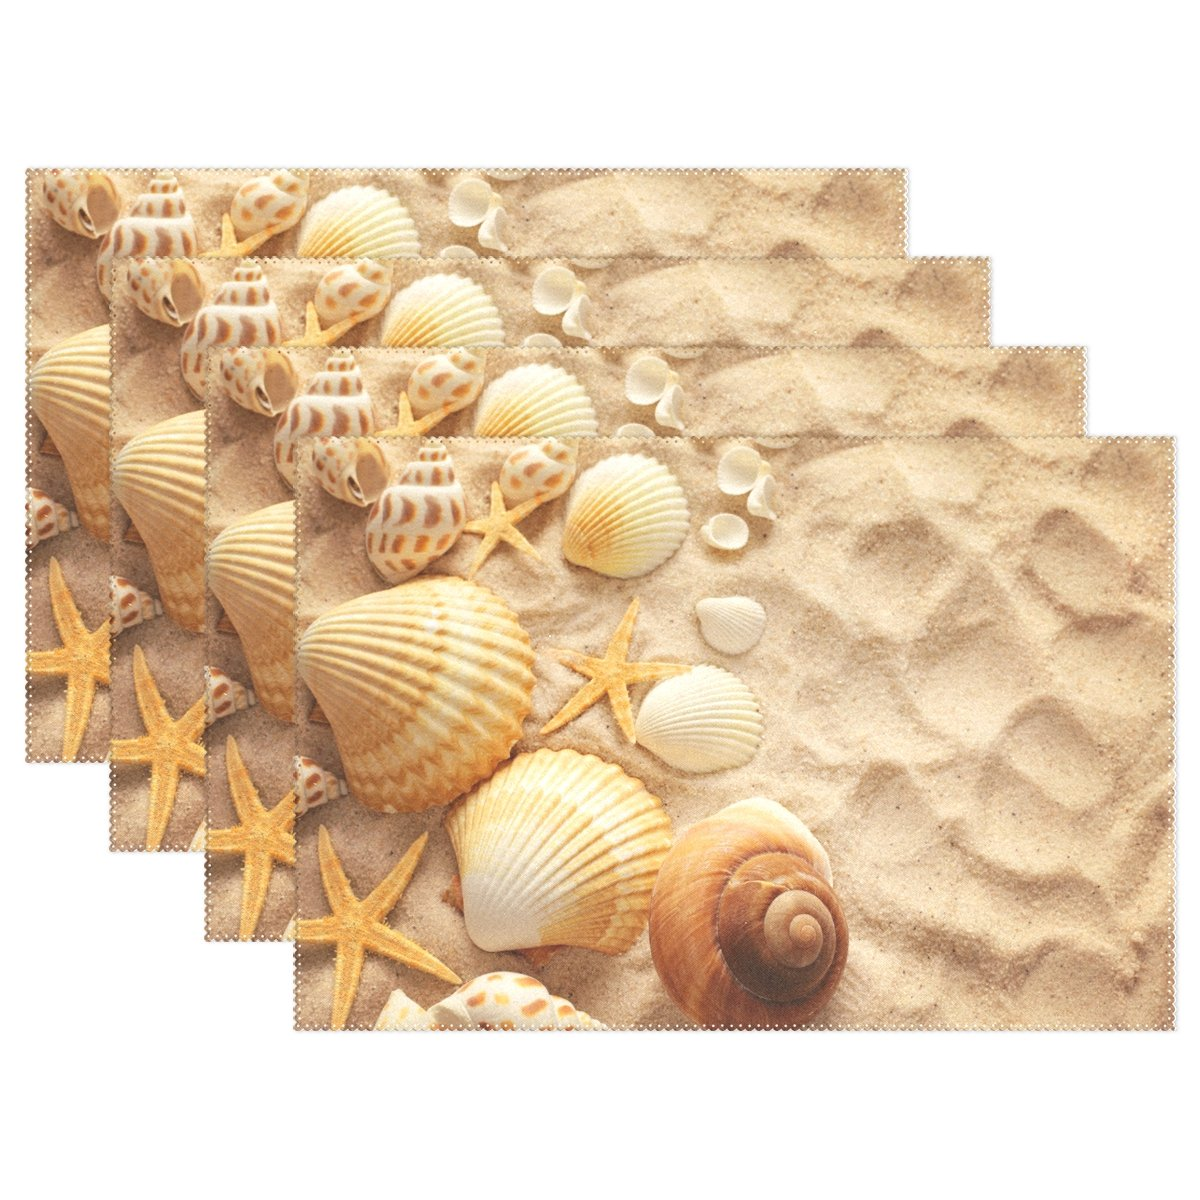 Wozo海ビーチヒトデ貝プレースマットテーブルマット12